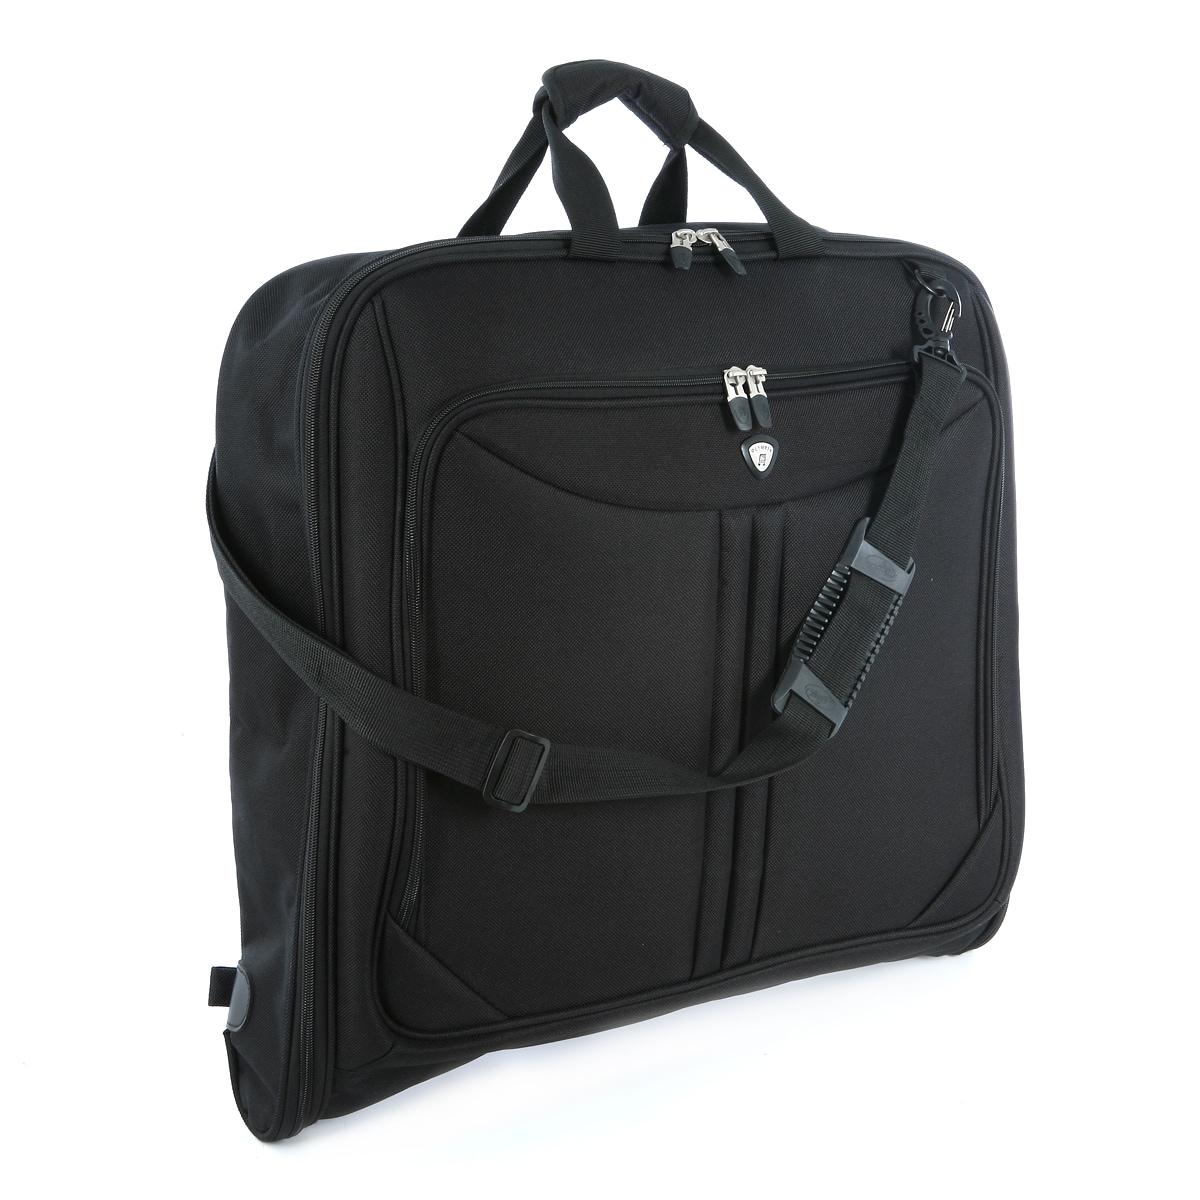 Olympia Vector Folding Garment Bag (Black)